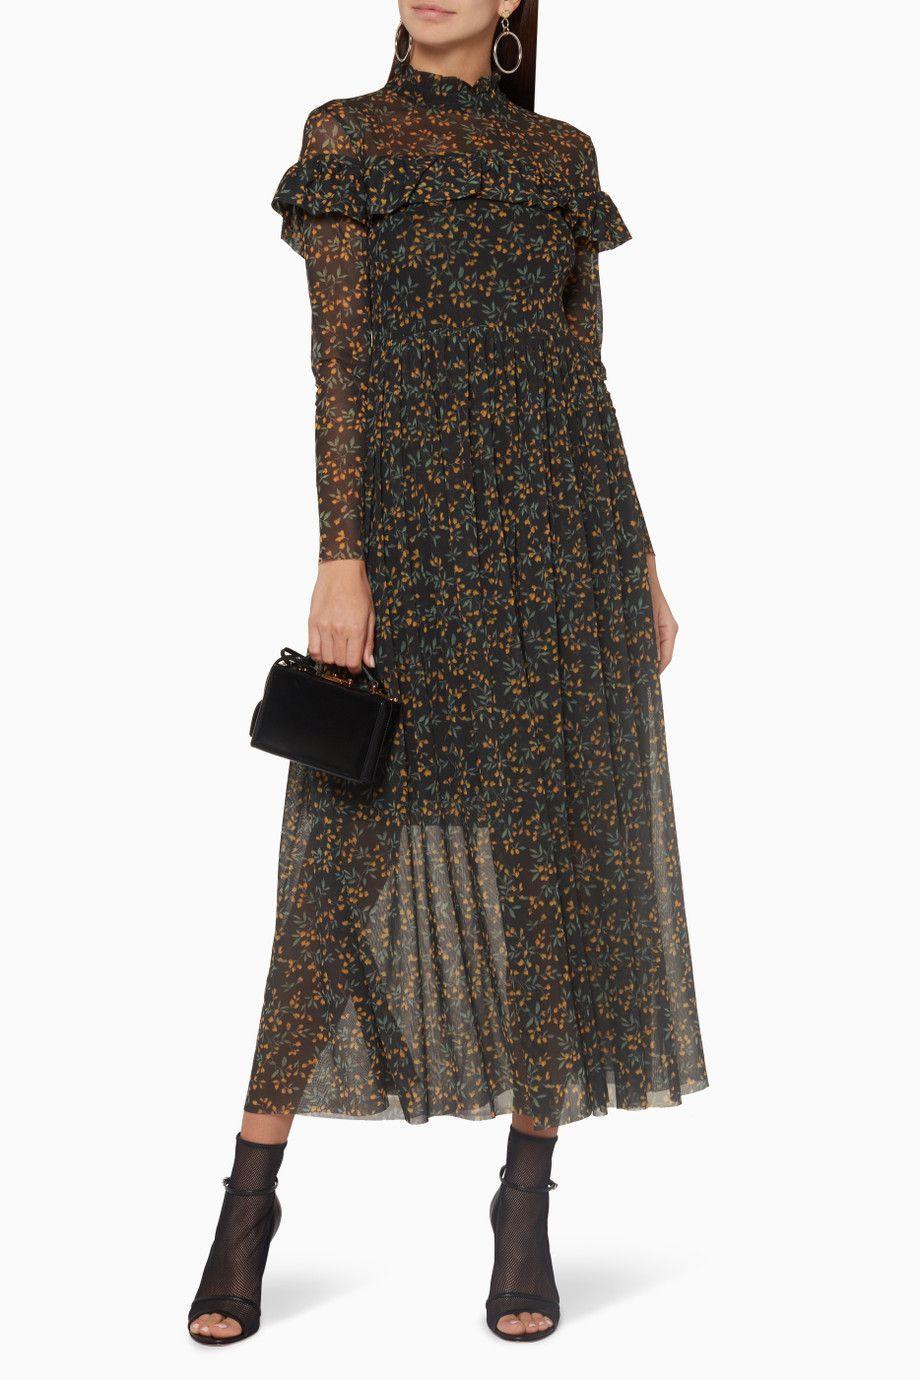 ec887476 Shop Luxury Ganni Black Tilden Mesh Maxi Dress | Ounass UAE | WISH ...